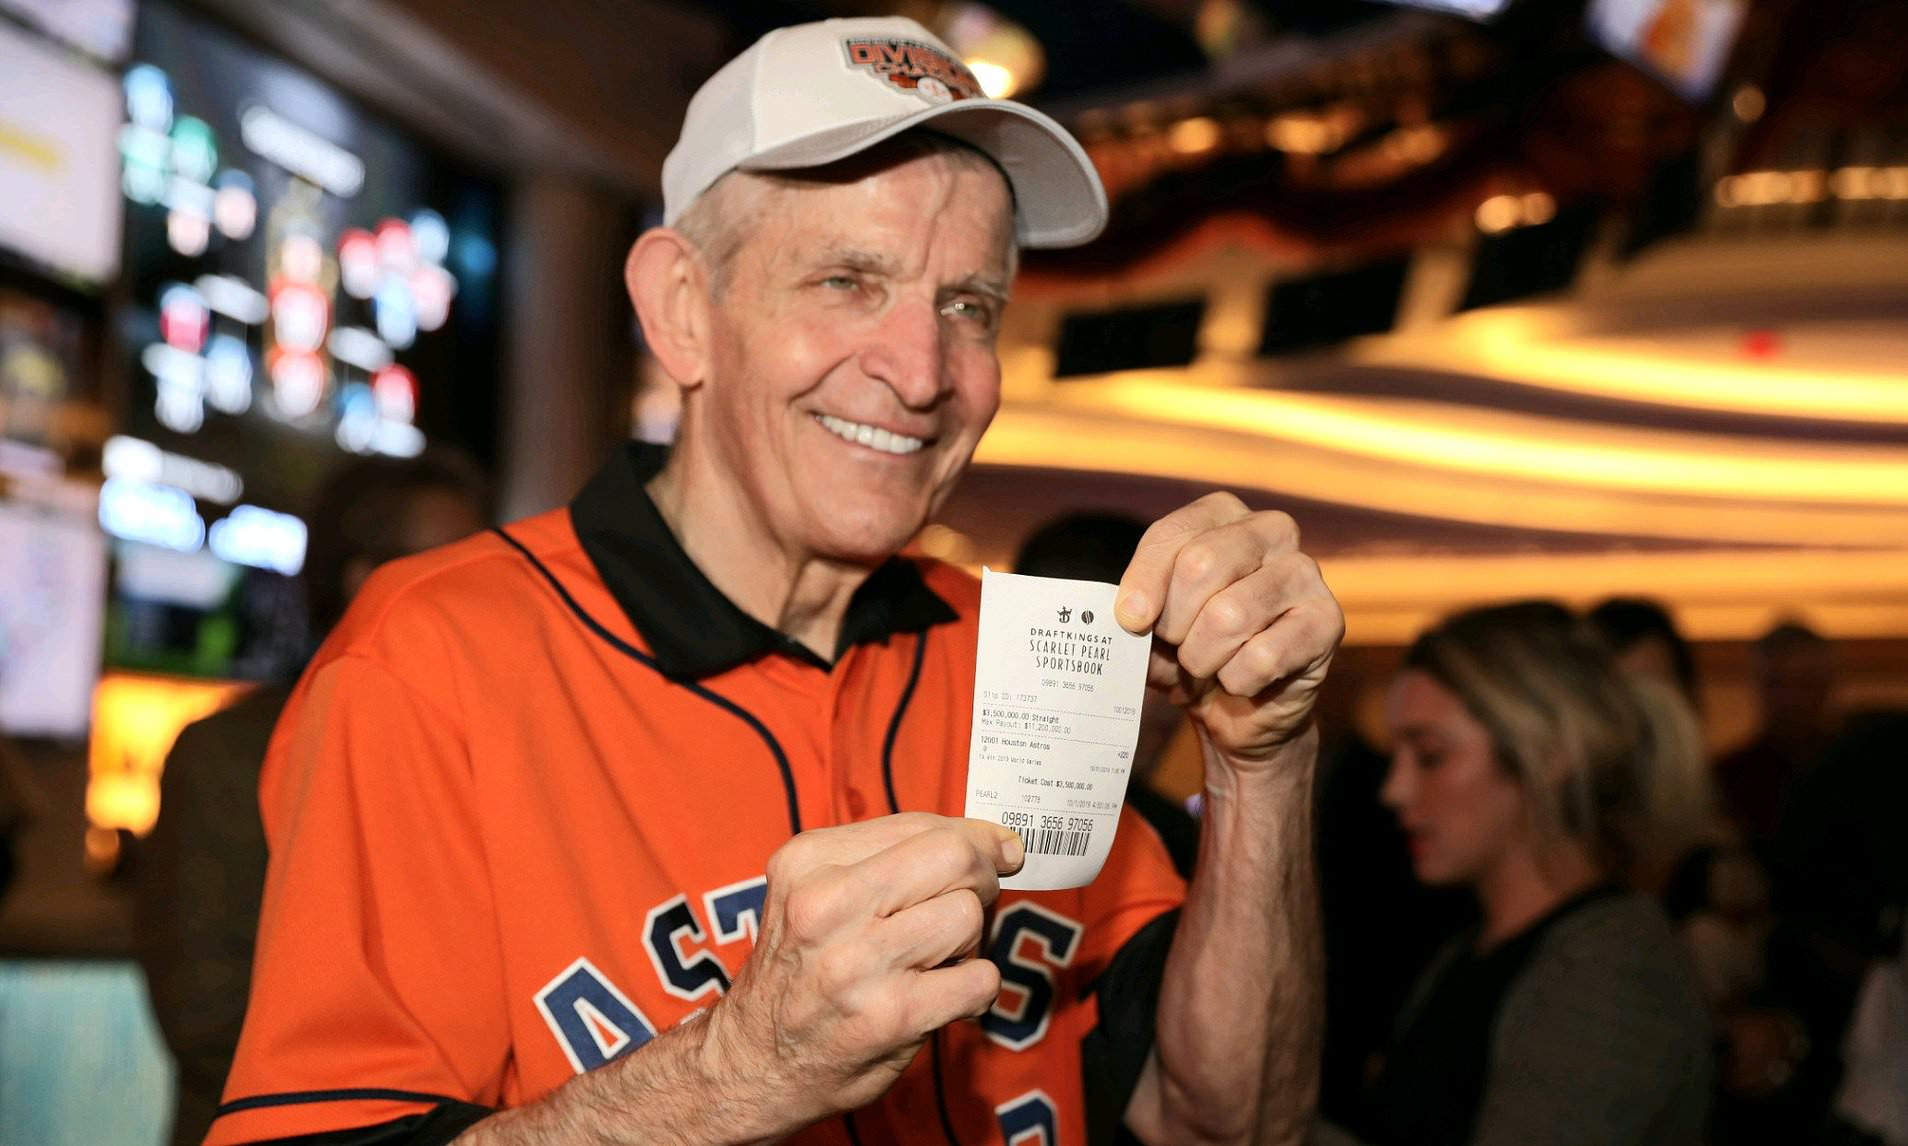 Mattress Mack Houston Astros bet wager World Series Twins Minnesota